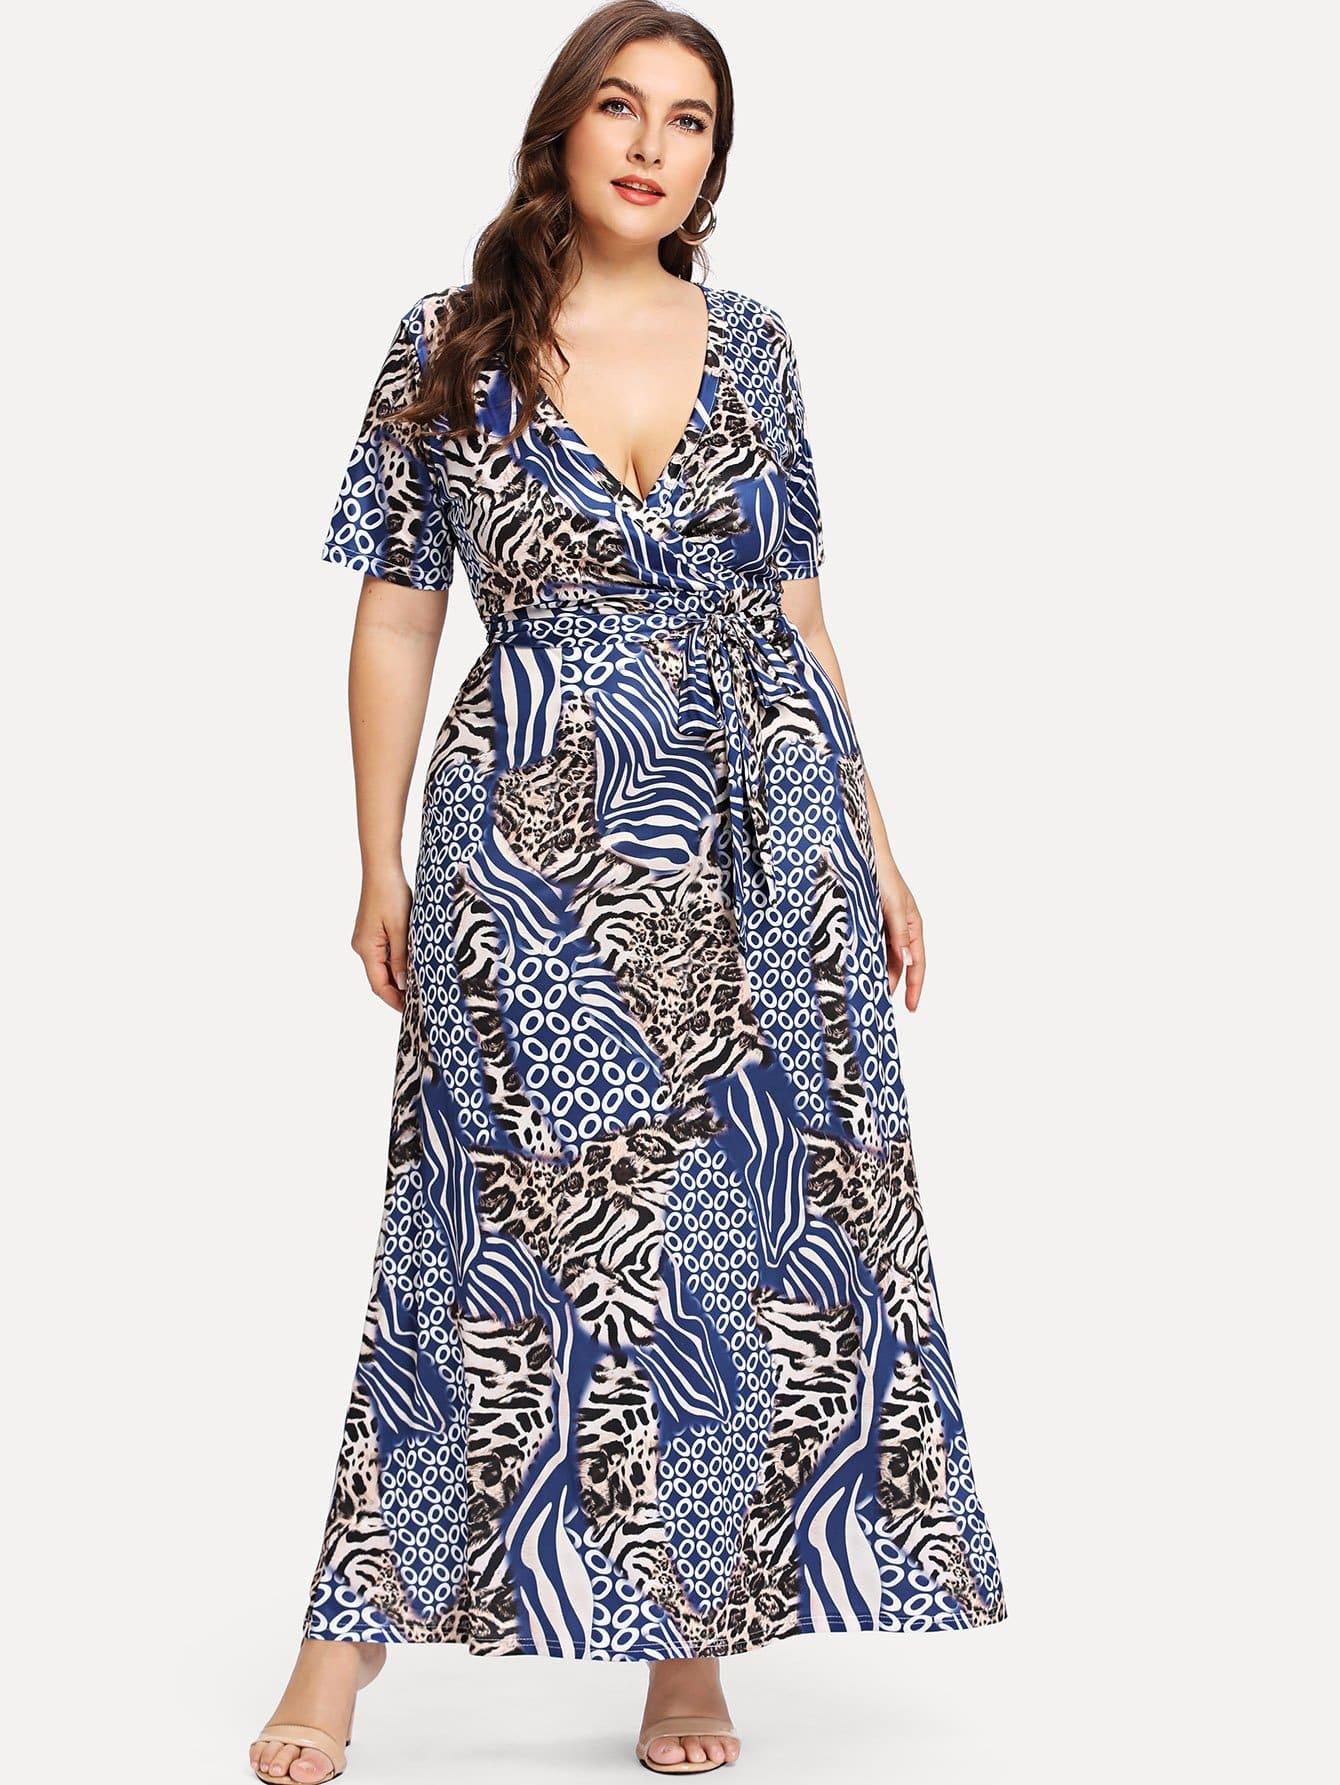 Mixed Print Wrap Dress mixed print dress